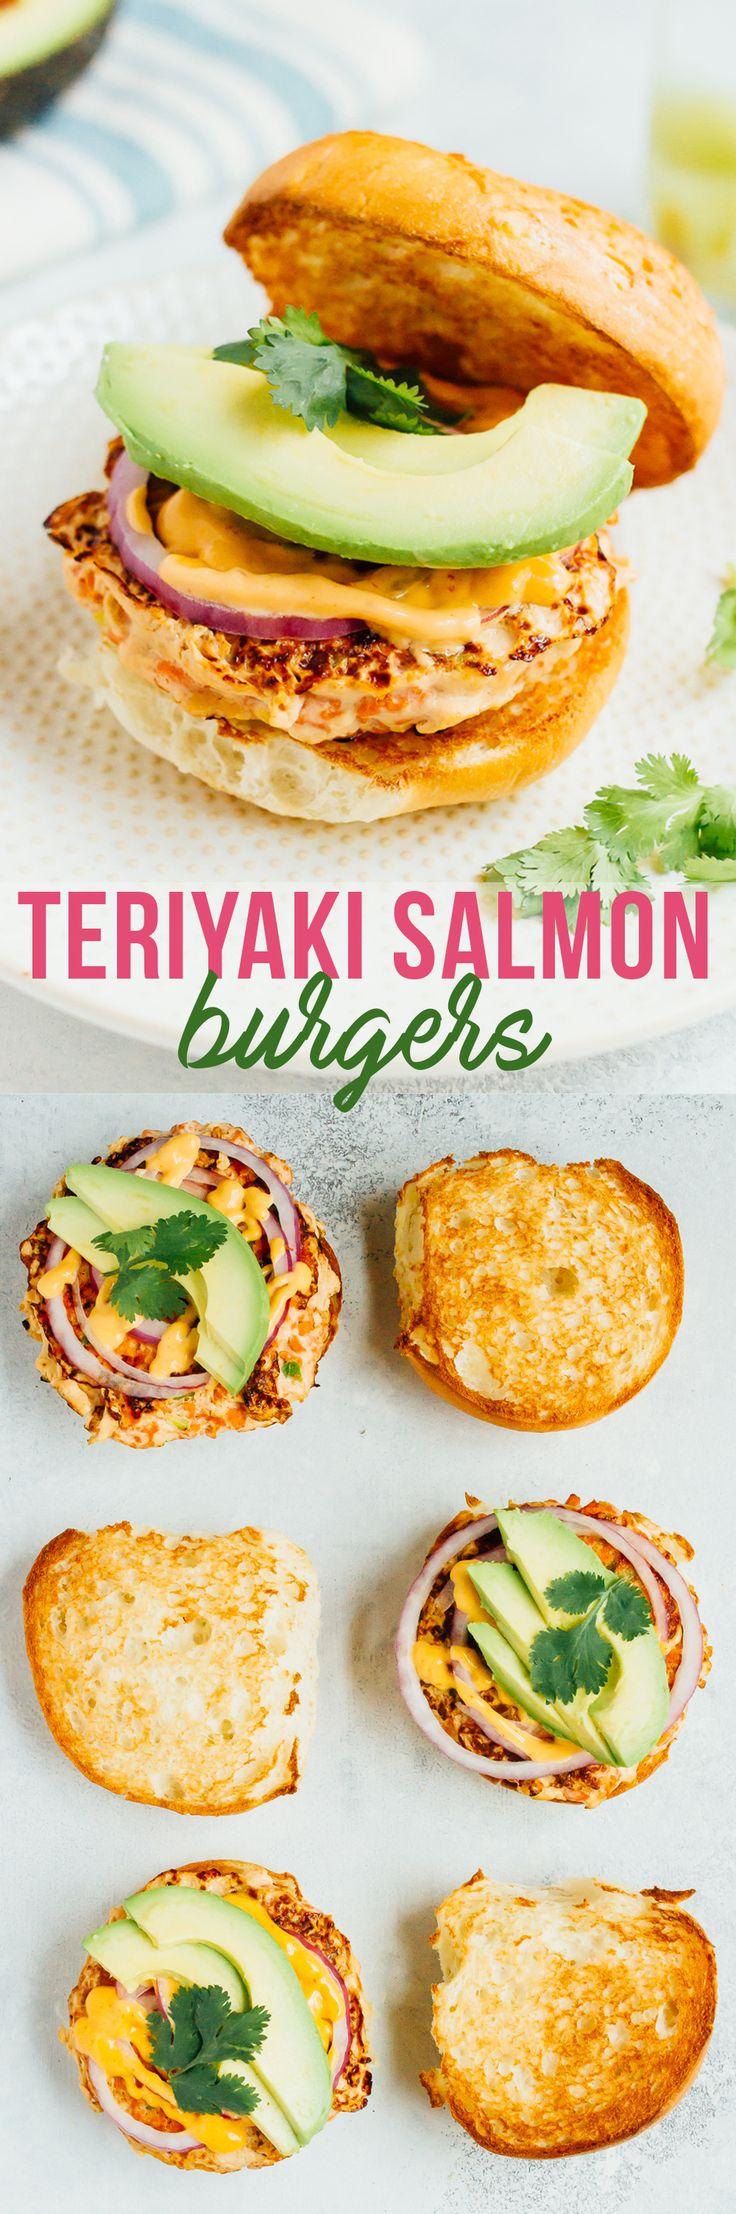 Teriyaki Salmon Burgers with Sriracha Mayo, Avocado, Red Onion and Cilantro.